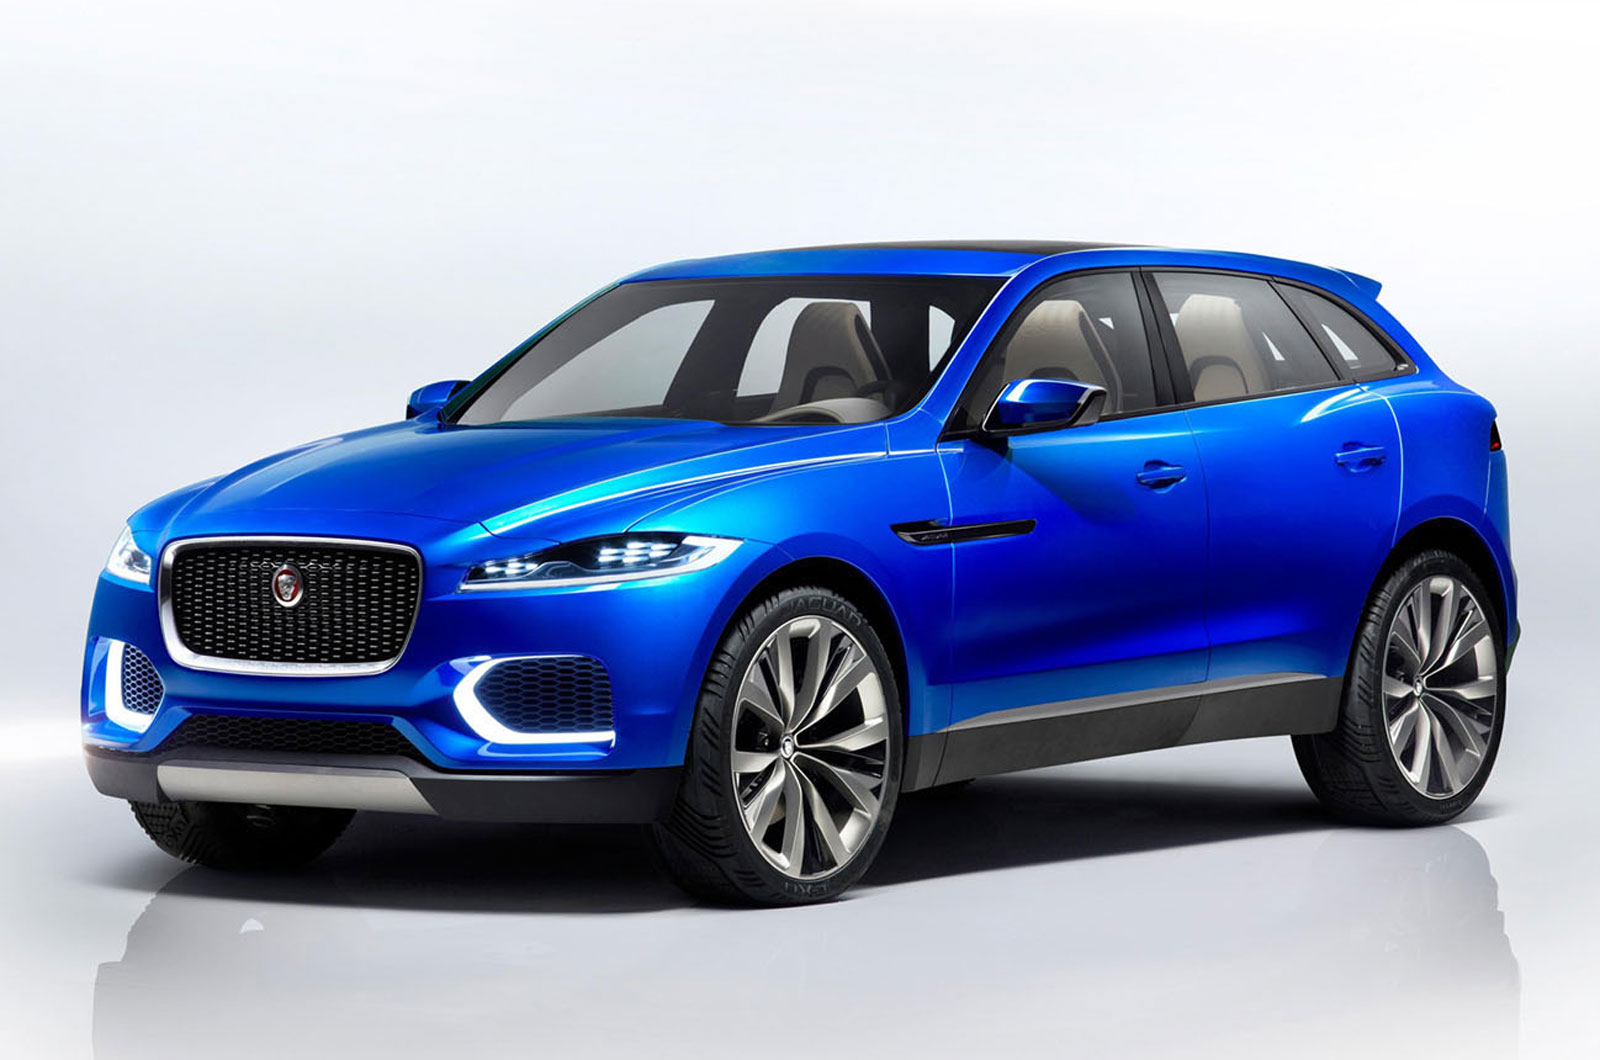 Jaguar's new 2016 SUV 'is not an SUV' | Autocar